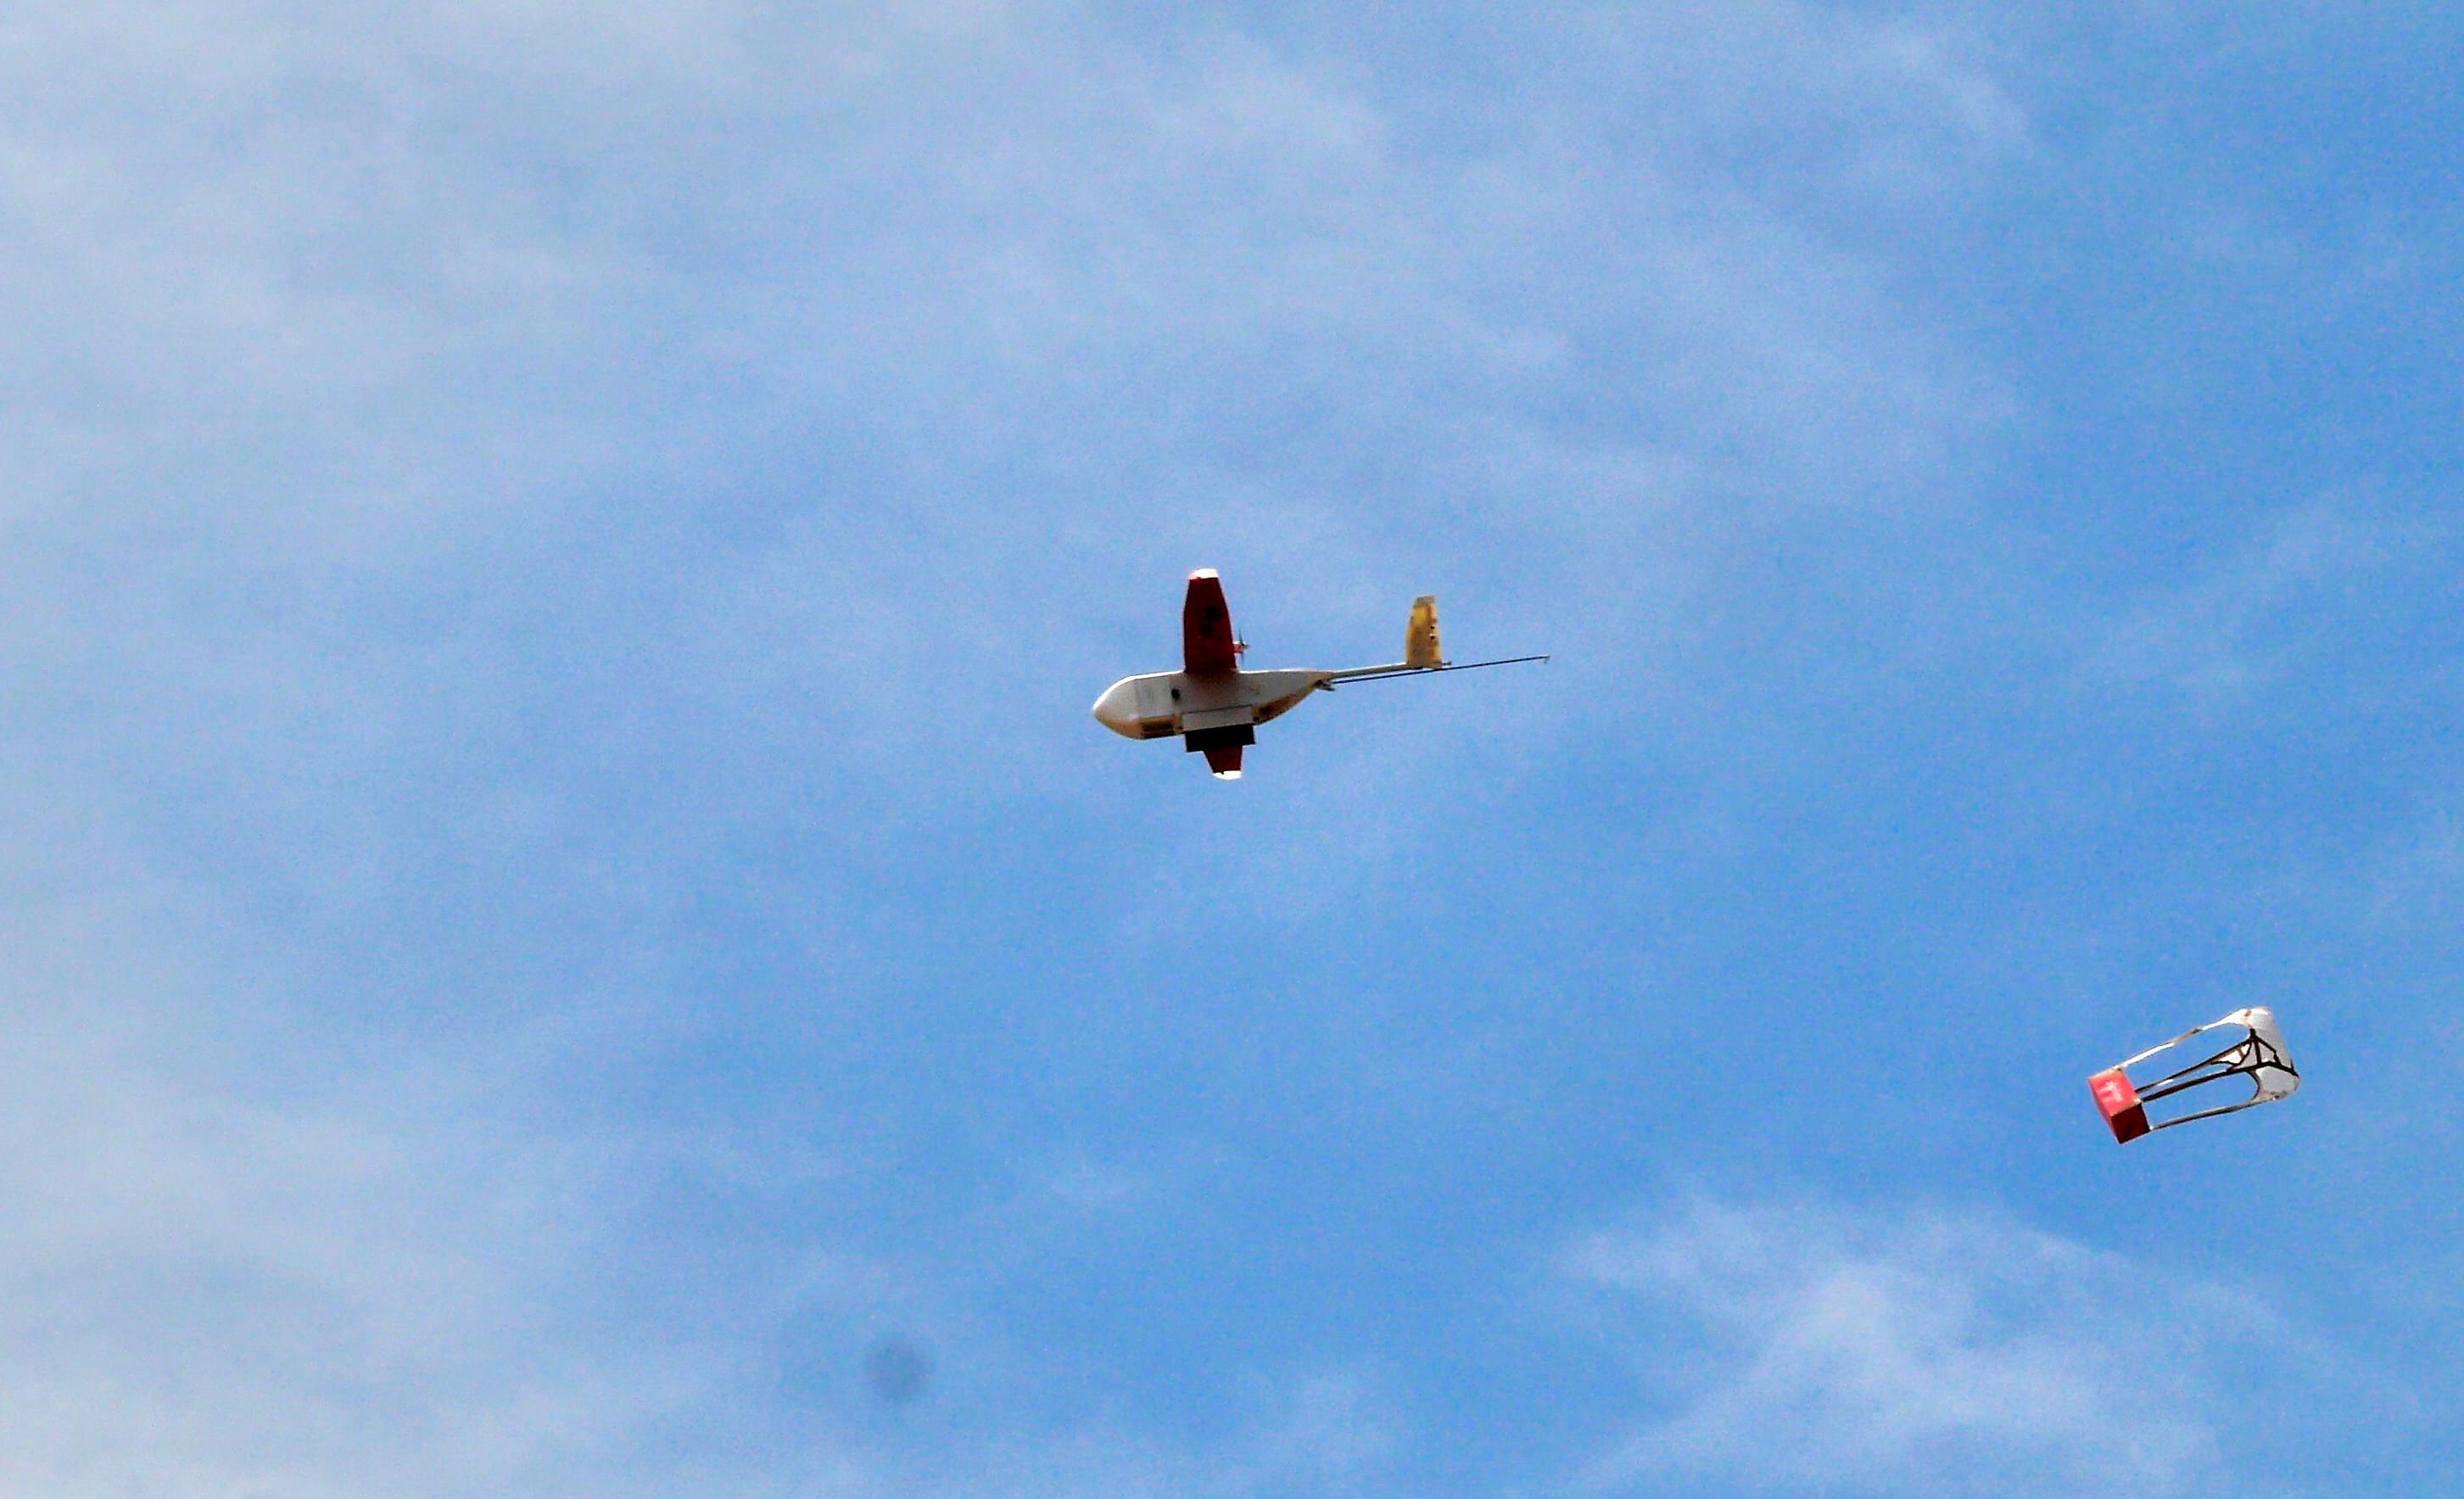 image of a Zipline drone delivering supplies